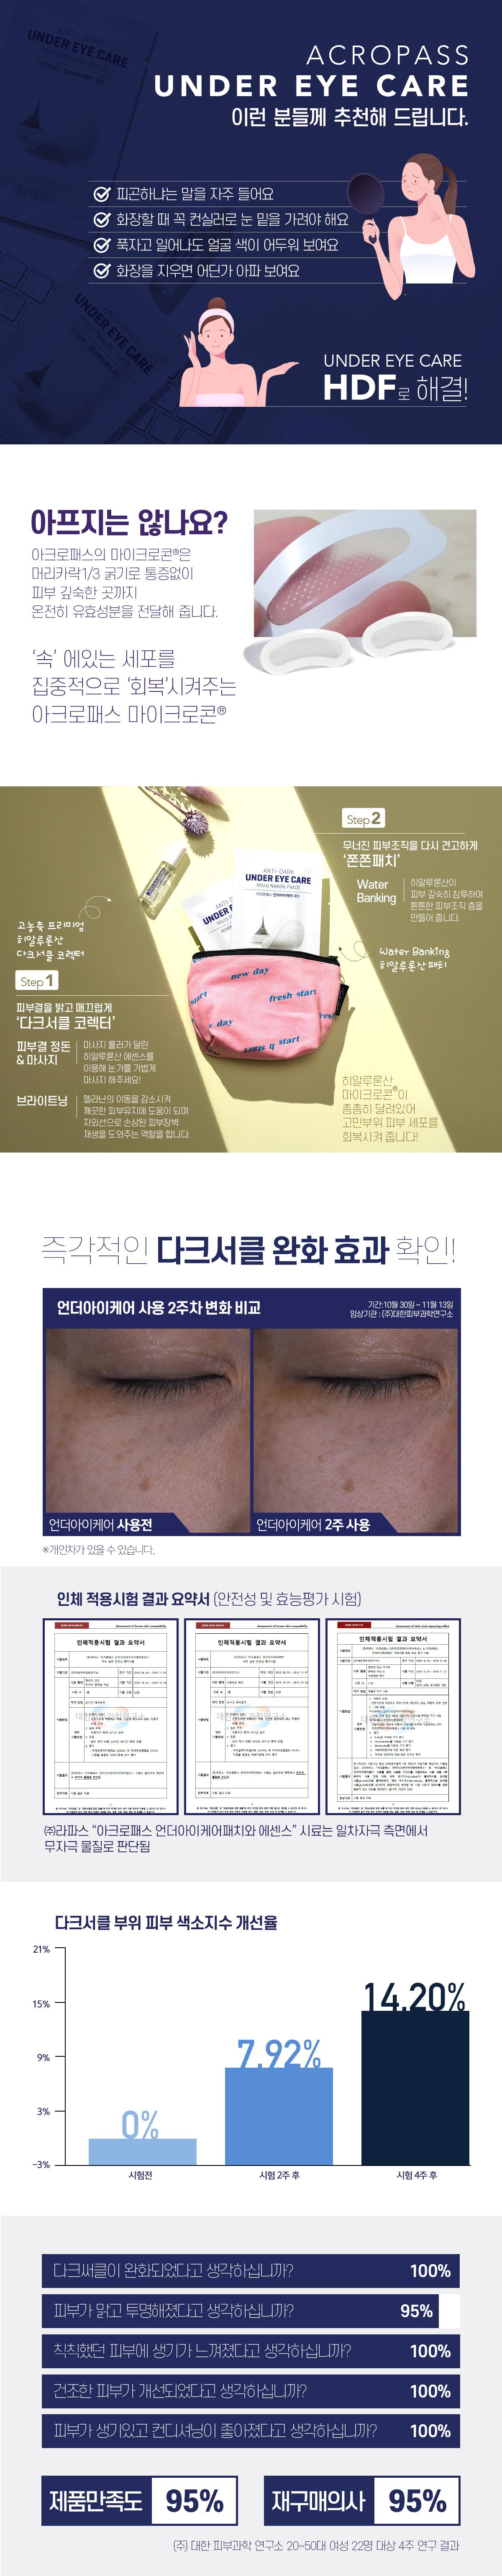 under_eye_care_02.jpg